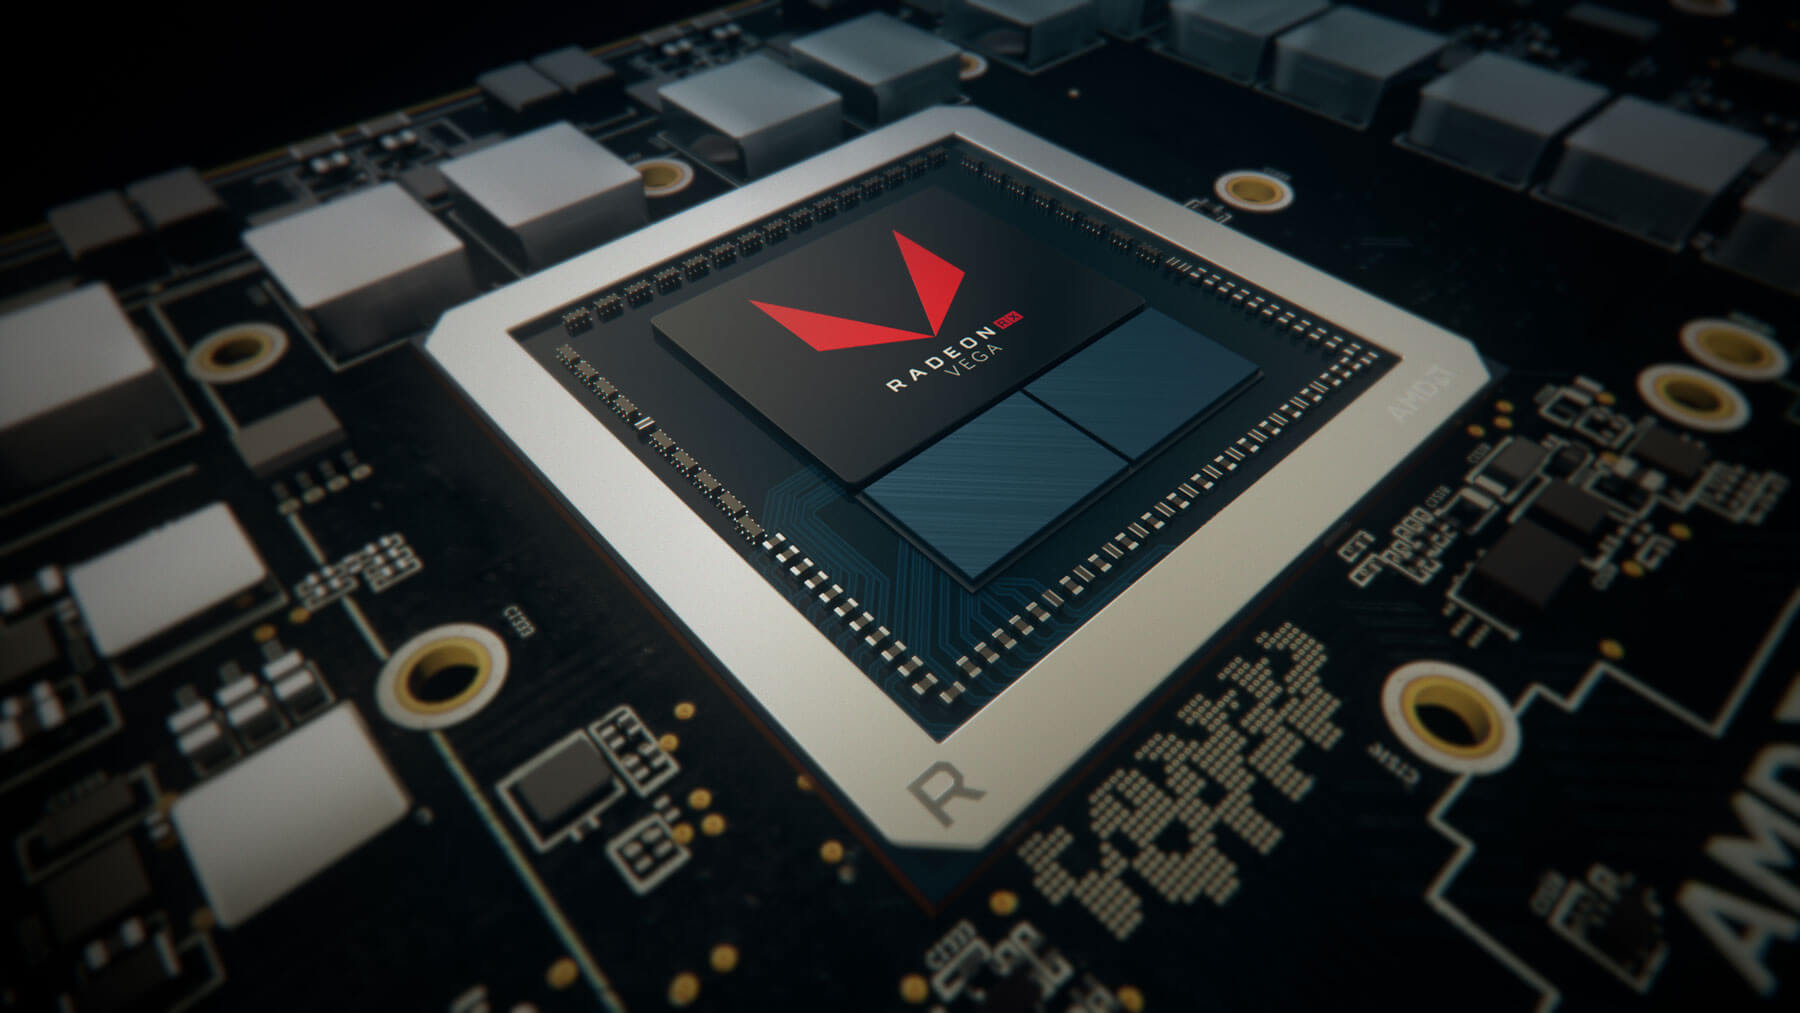 Radeon™ RX VEGA 56 8G | Graphics Card - GIGABYTE Global